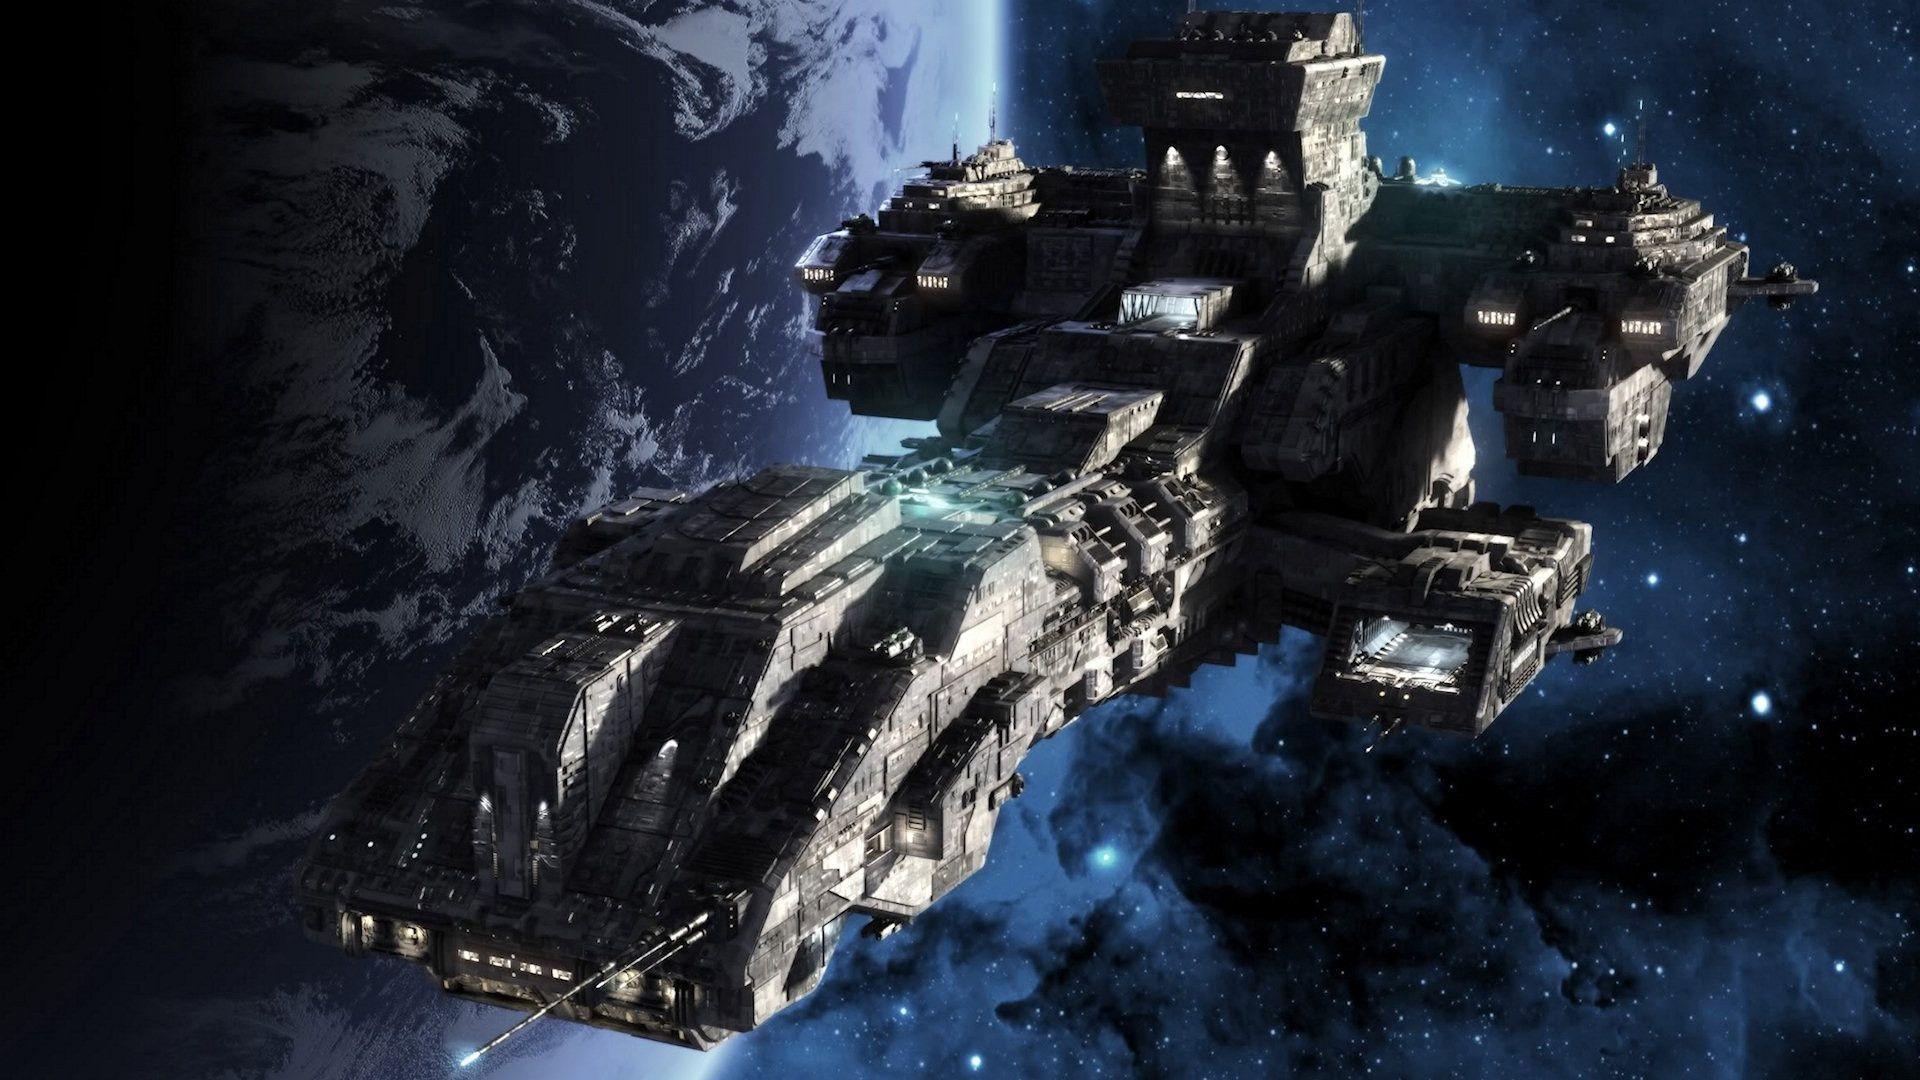 stargate wallpaper universe space - photo #29